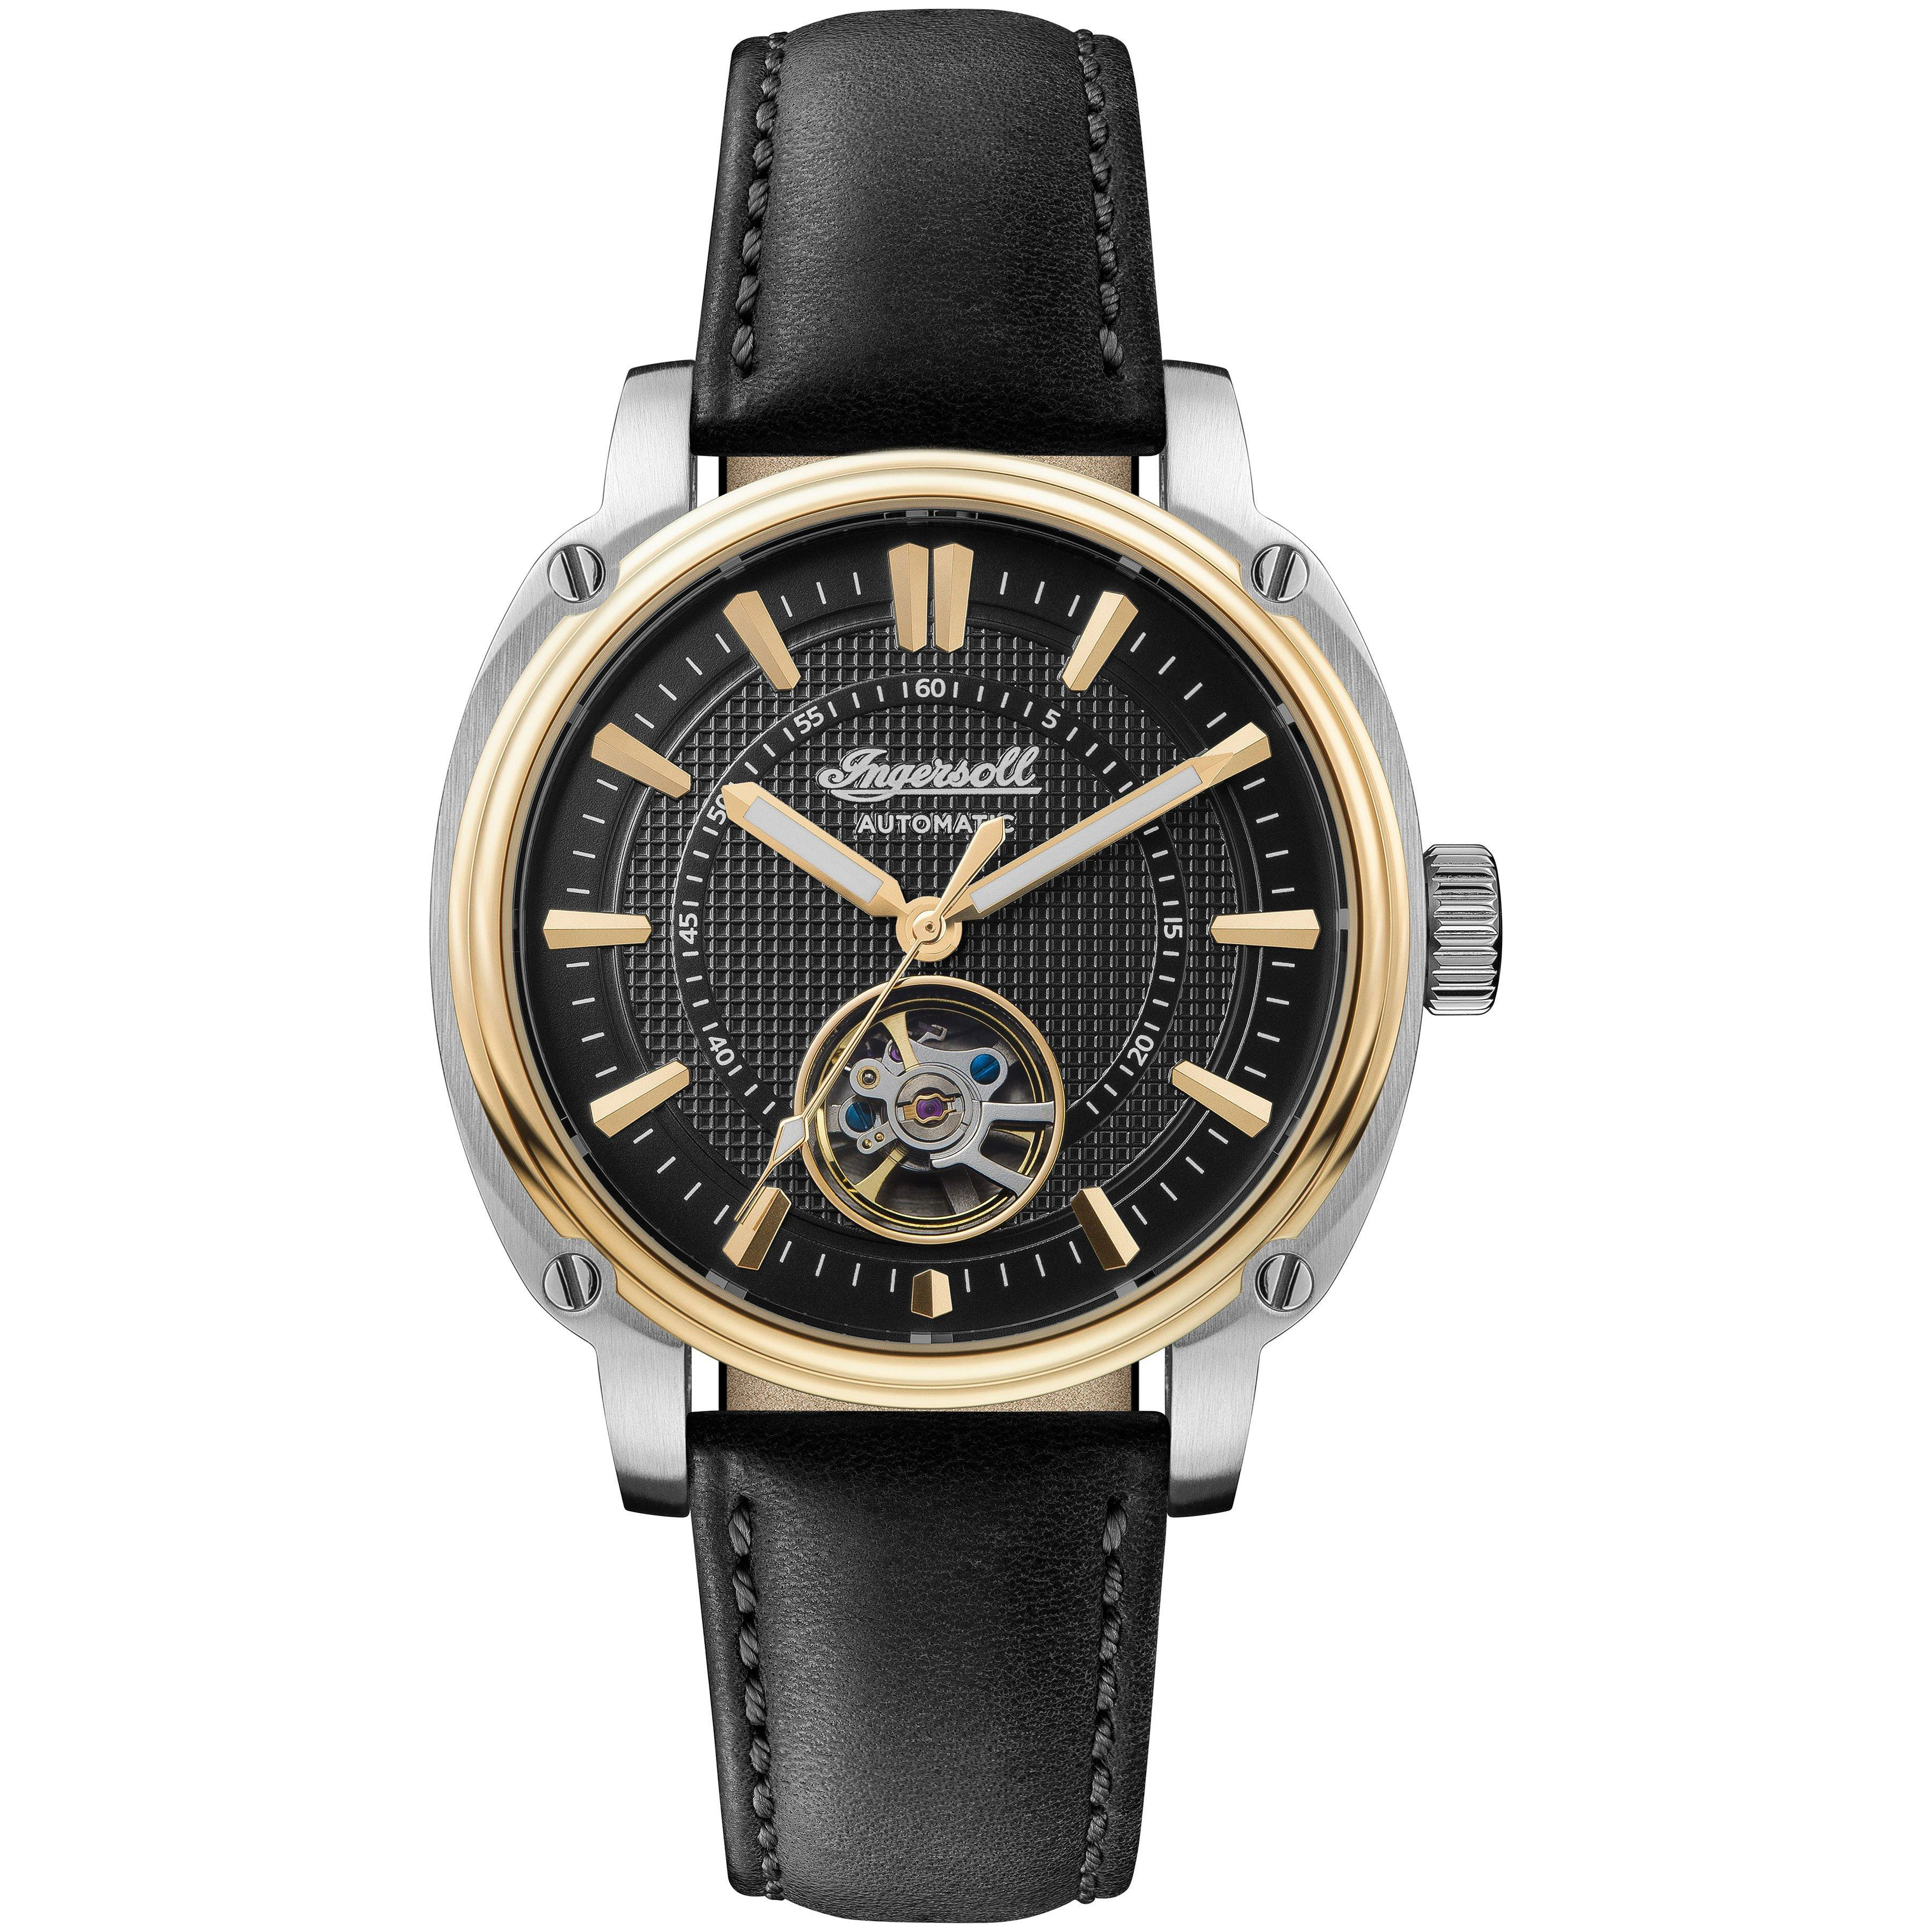 Ingersoll Director Automatic Men's Watch